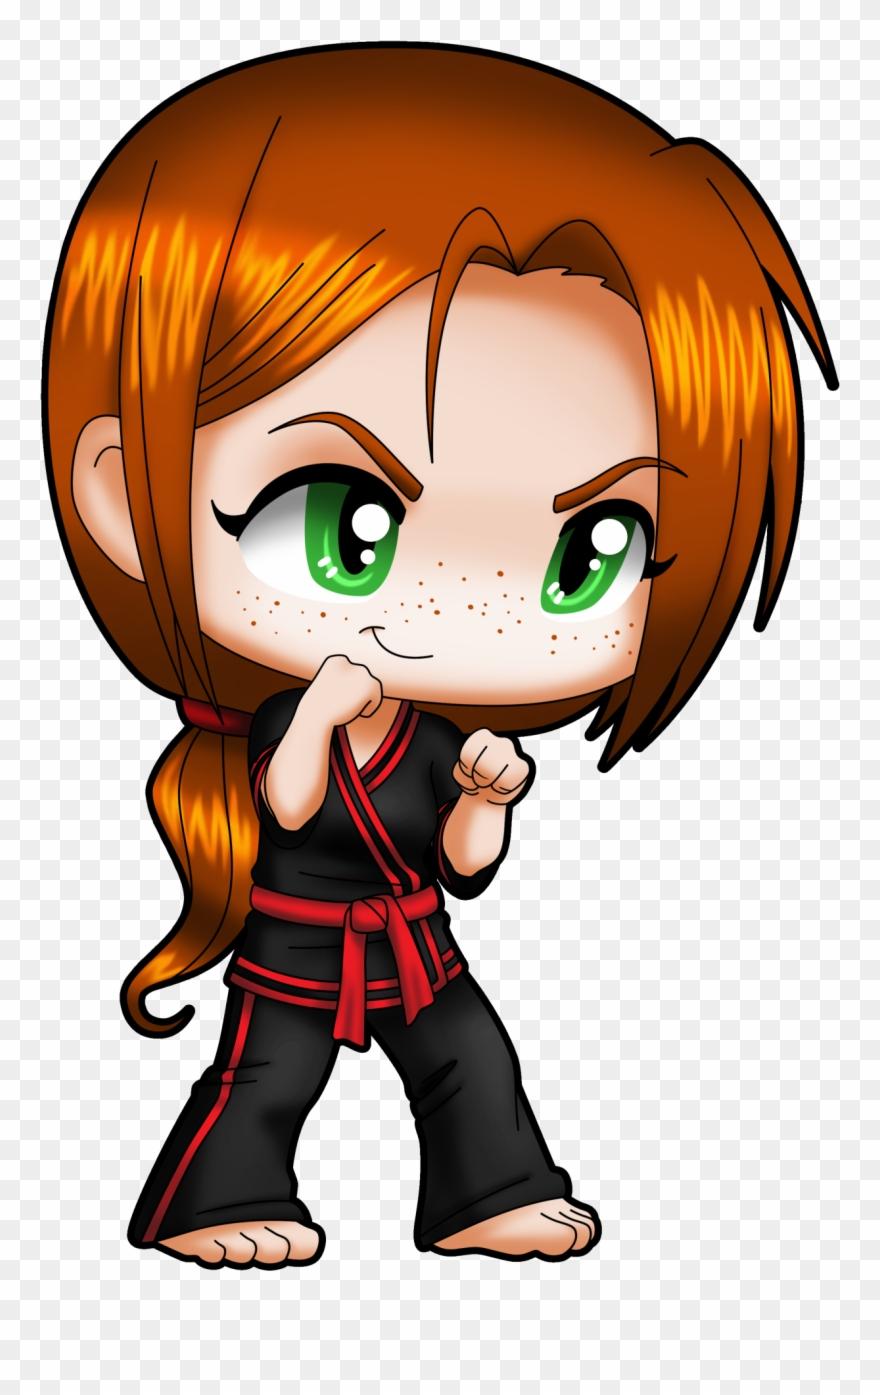 Mixed Martial Arts Clipart Child Karate Horizon Martial Arts Png Download 452733 Pinclipart